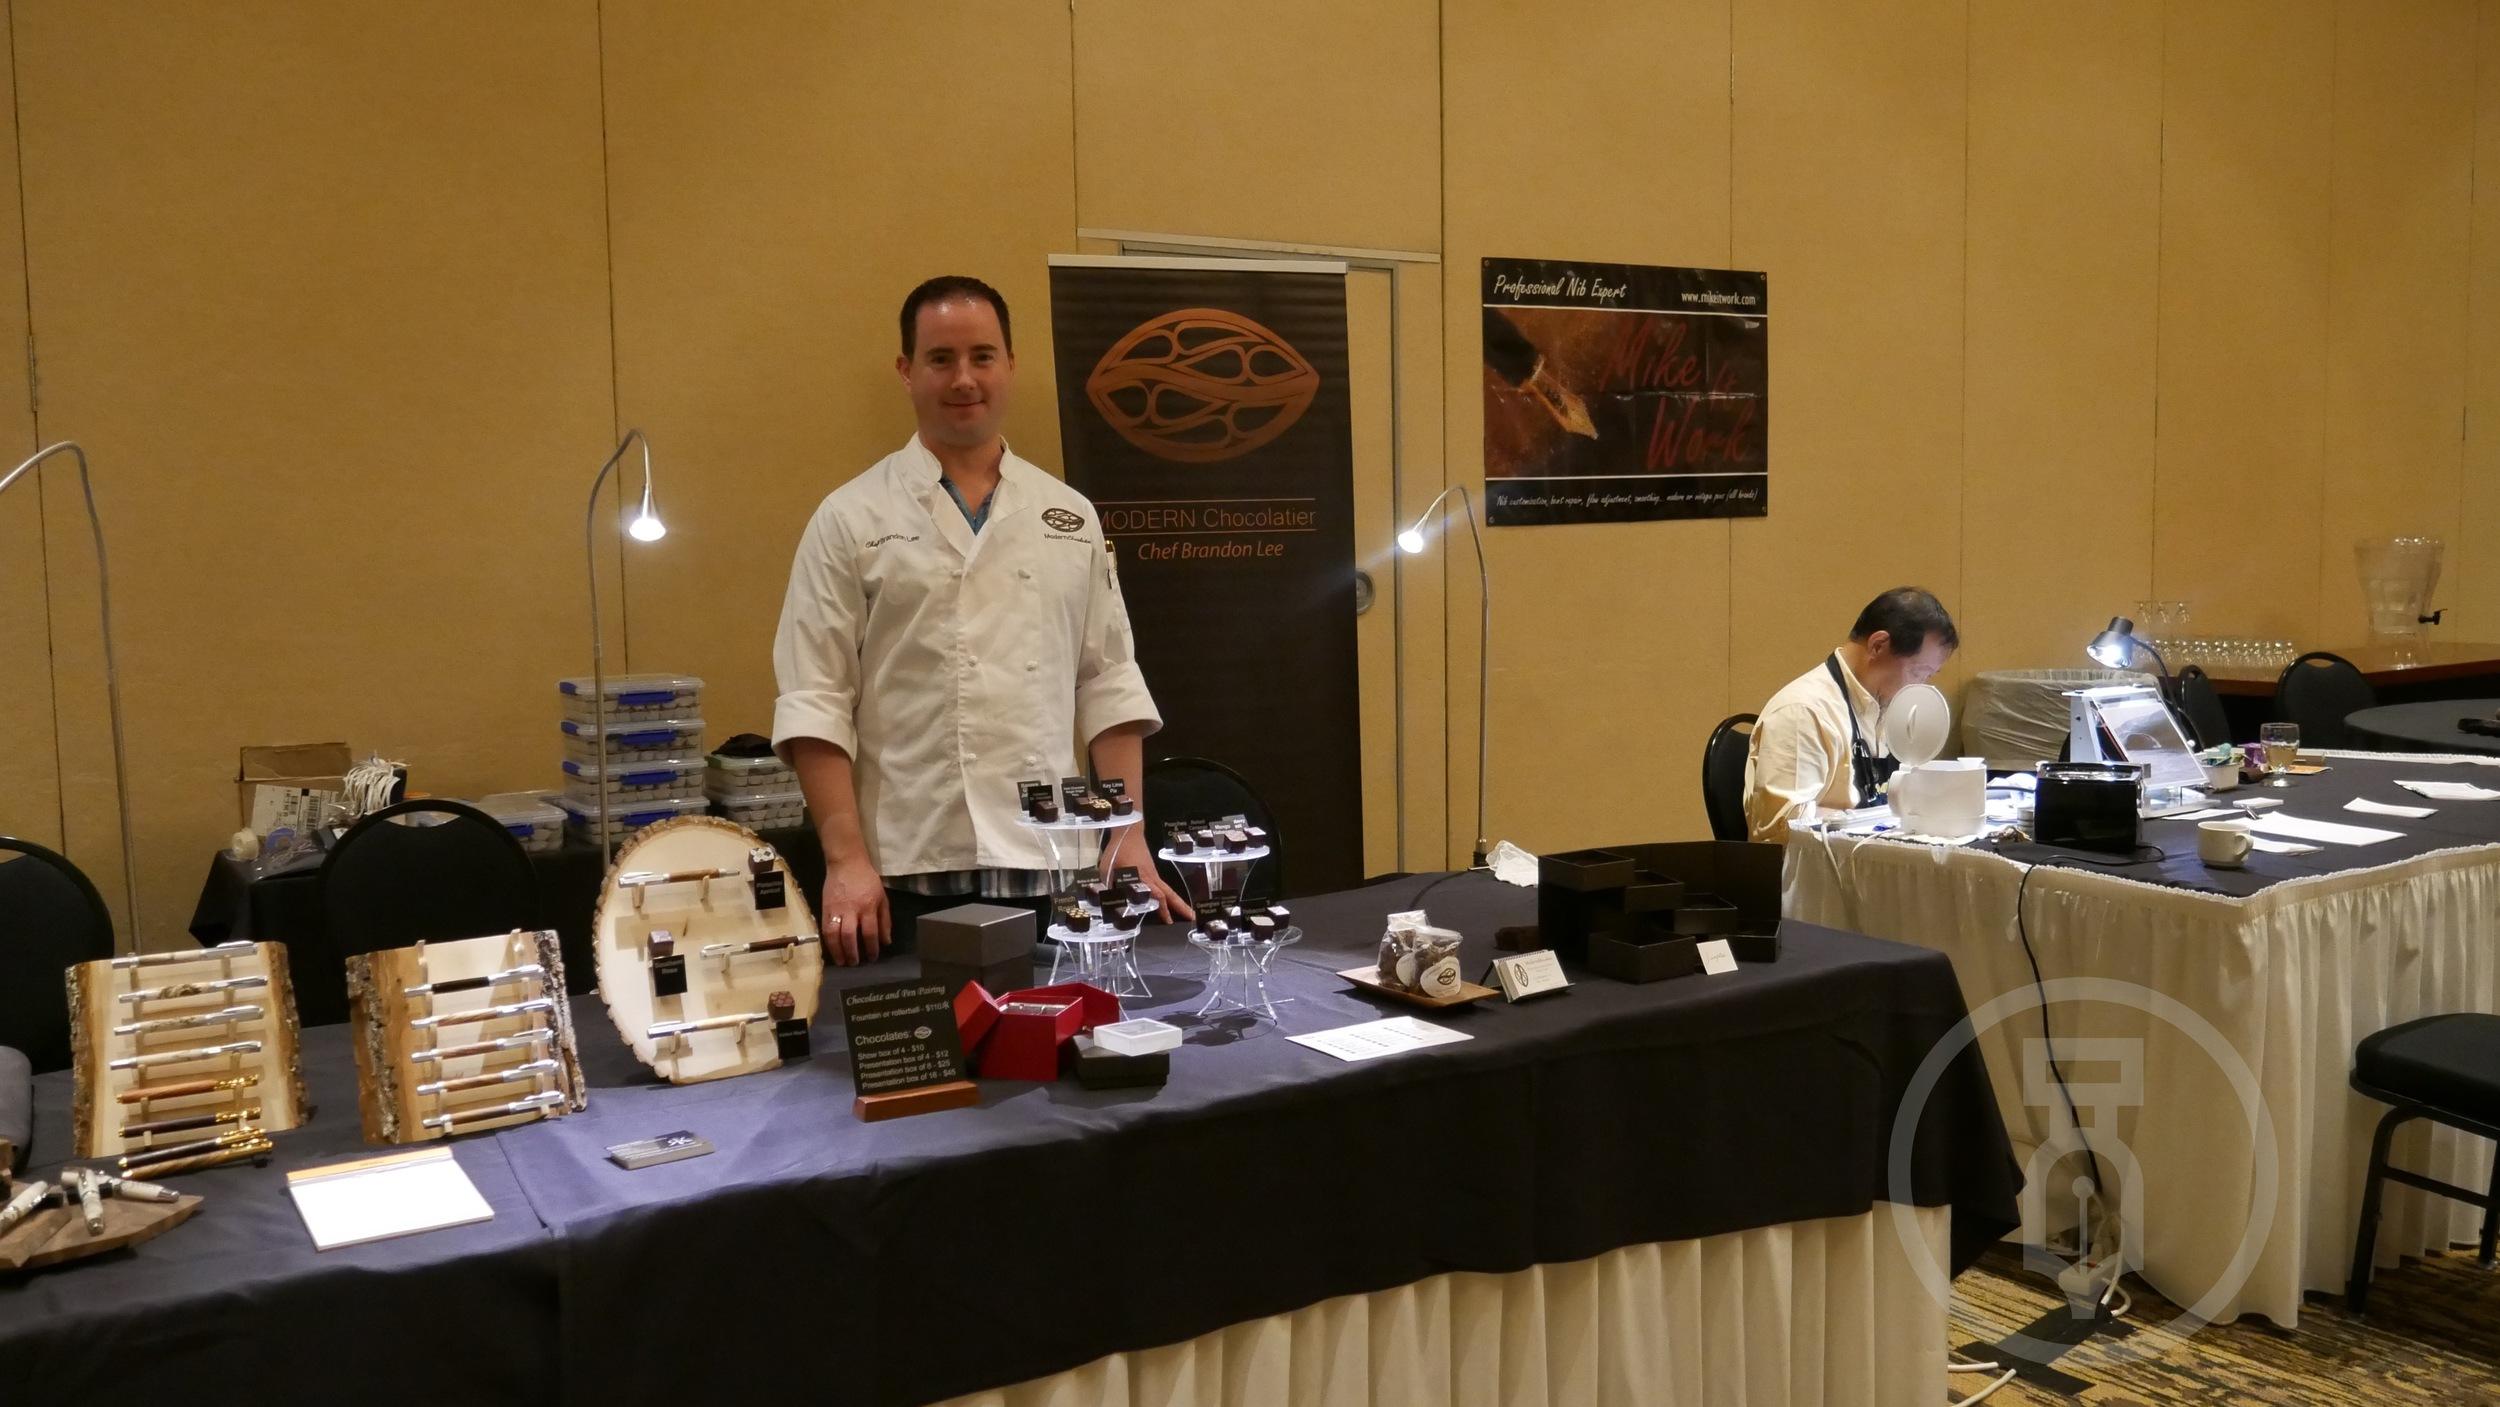 Chef Brandon Lee of Modern Chocolatier